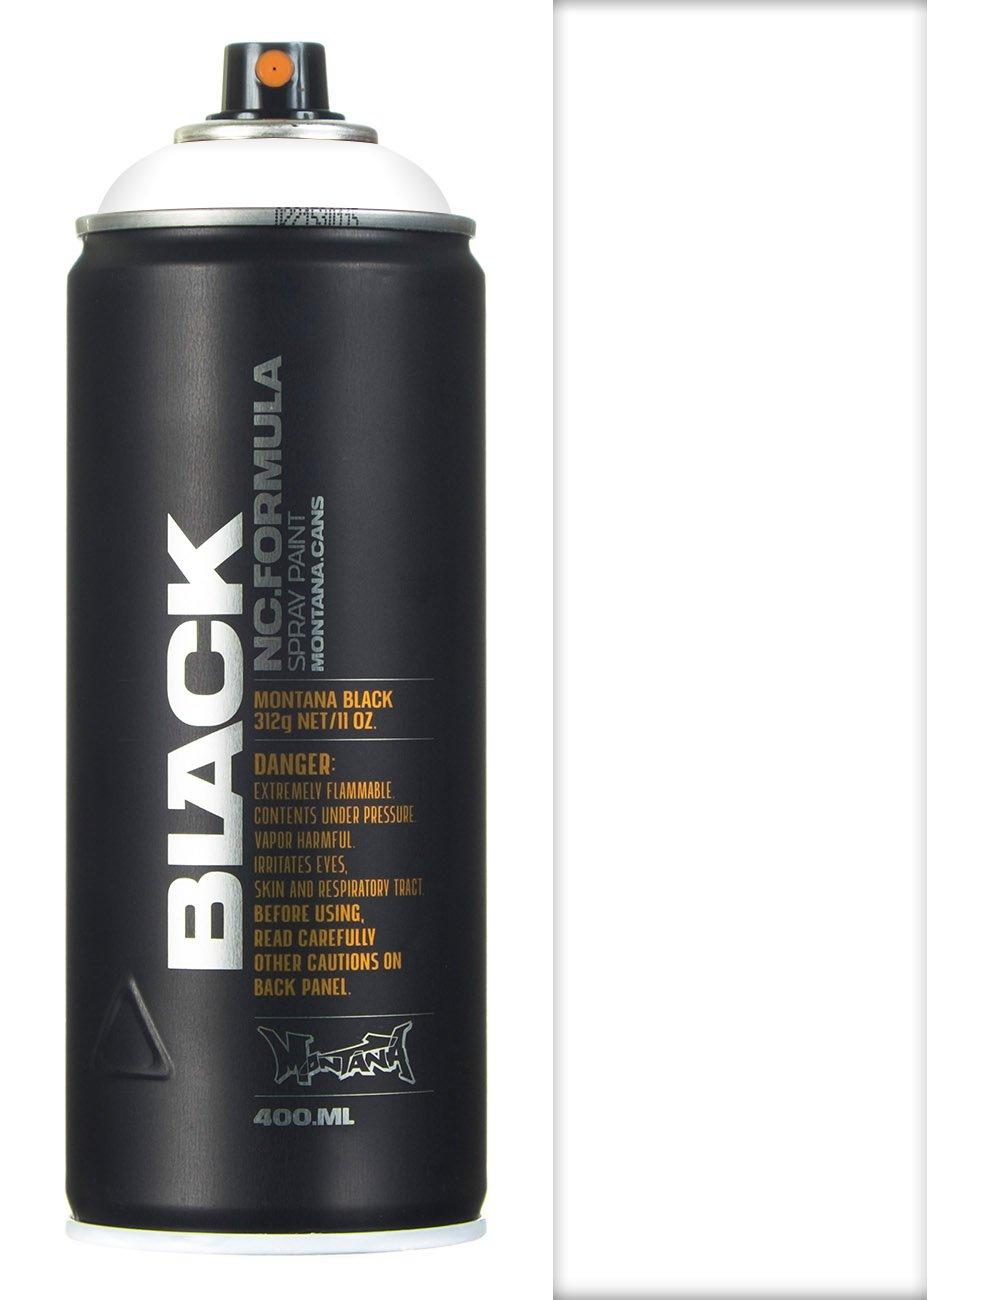 Home spray paint supplies spray paint montana black